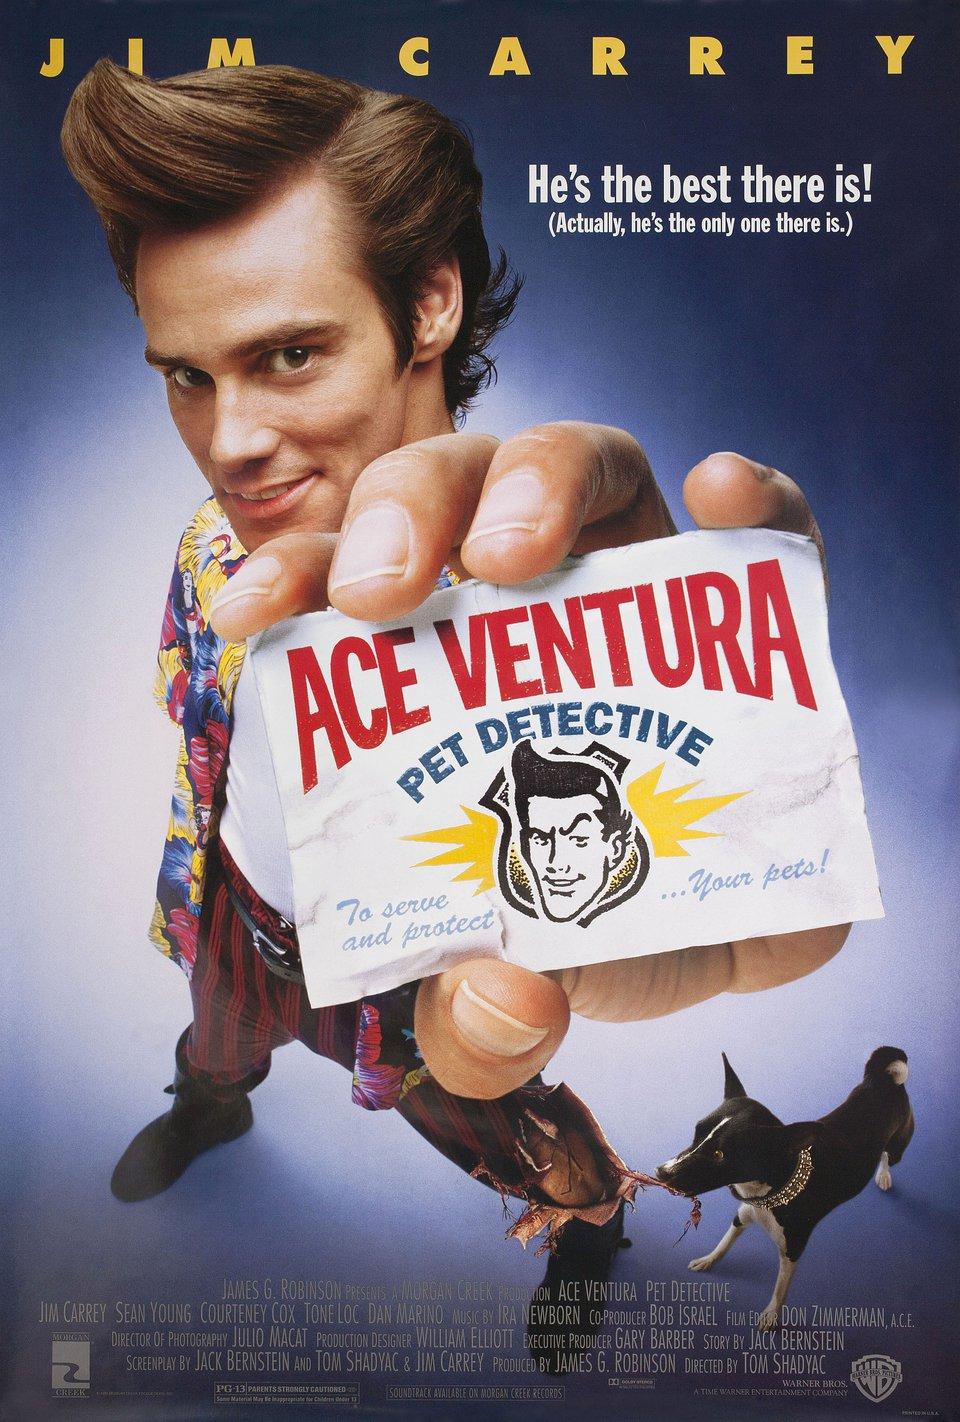 Ace Ventura: Pet Detective 1994 U.S. One Sheet Poster